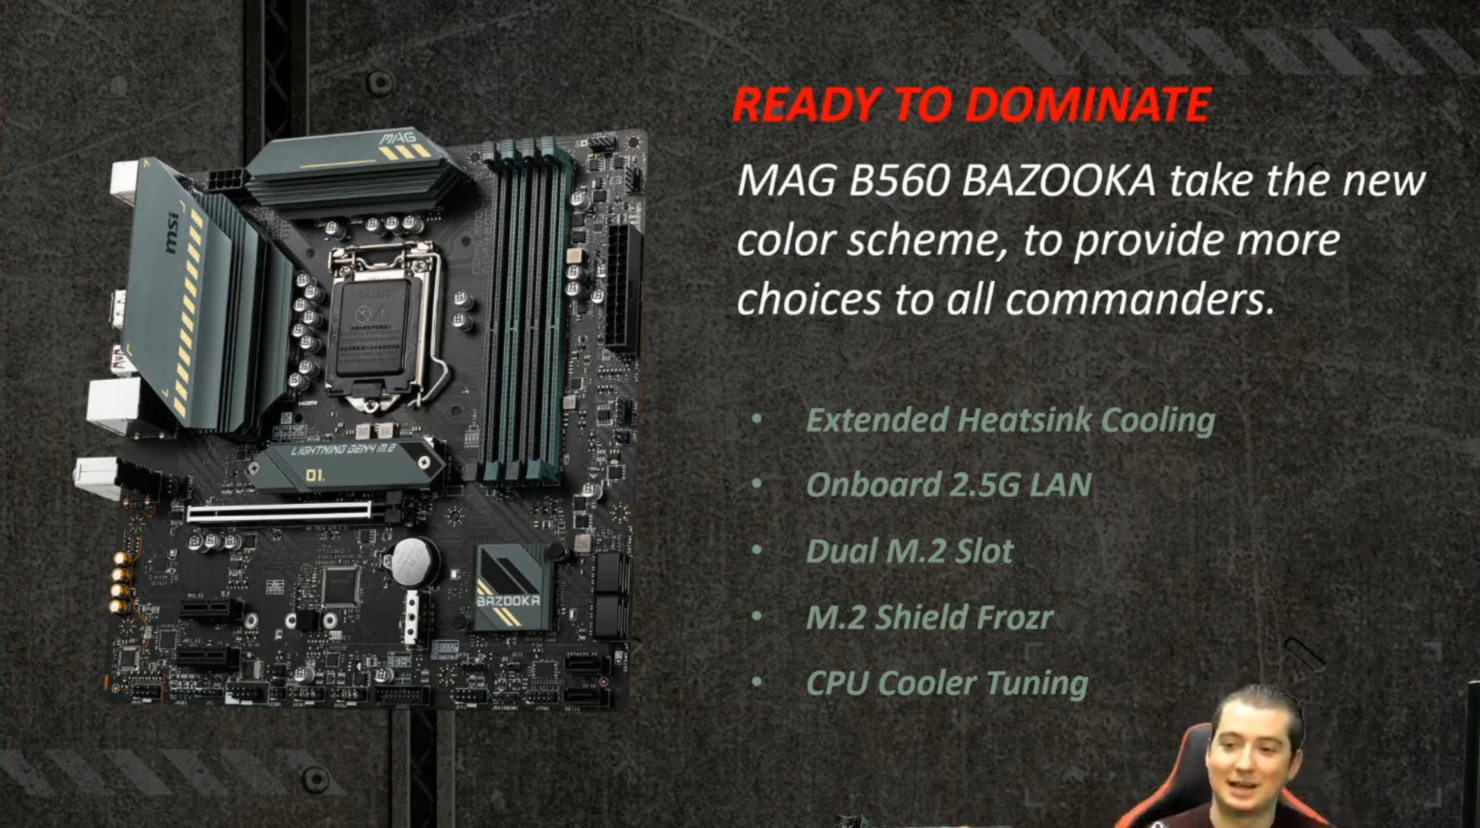 msi-b560-h510-motherboards-intel-10th-gen-11th-gen-desktop-cpus-_-prices-specs-_6